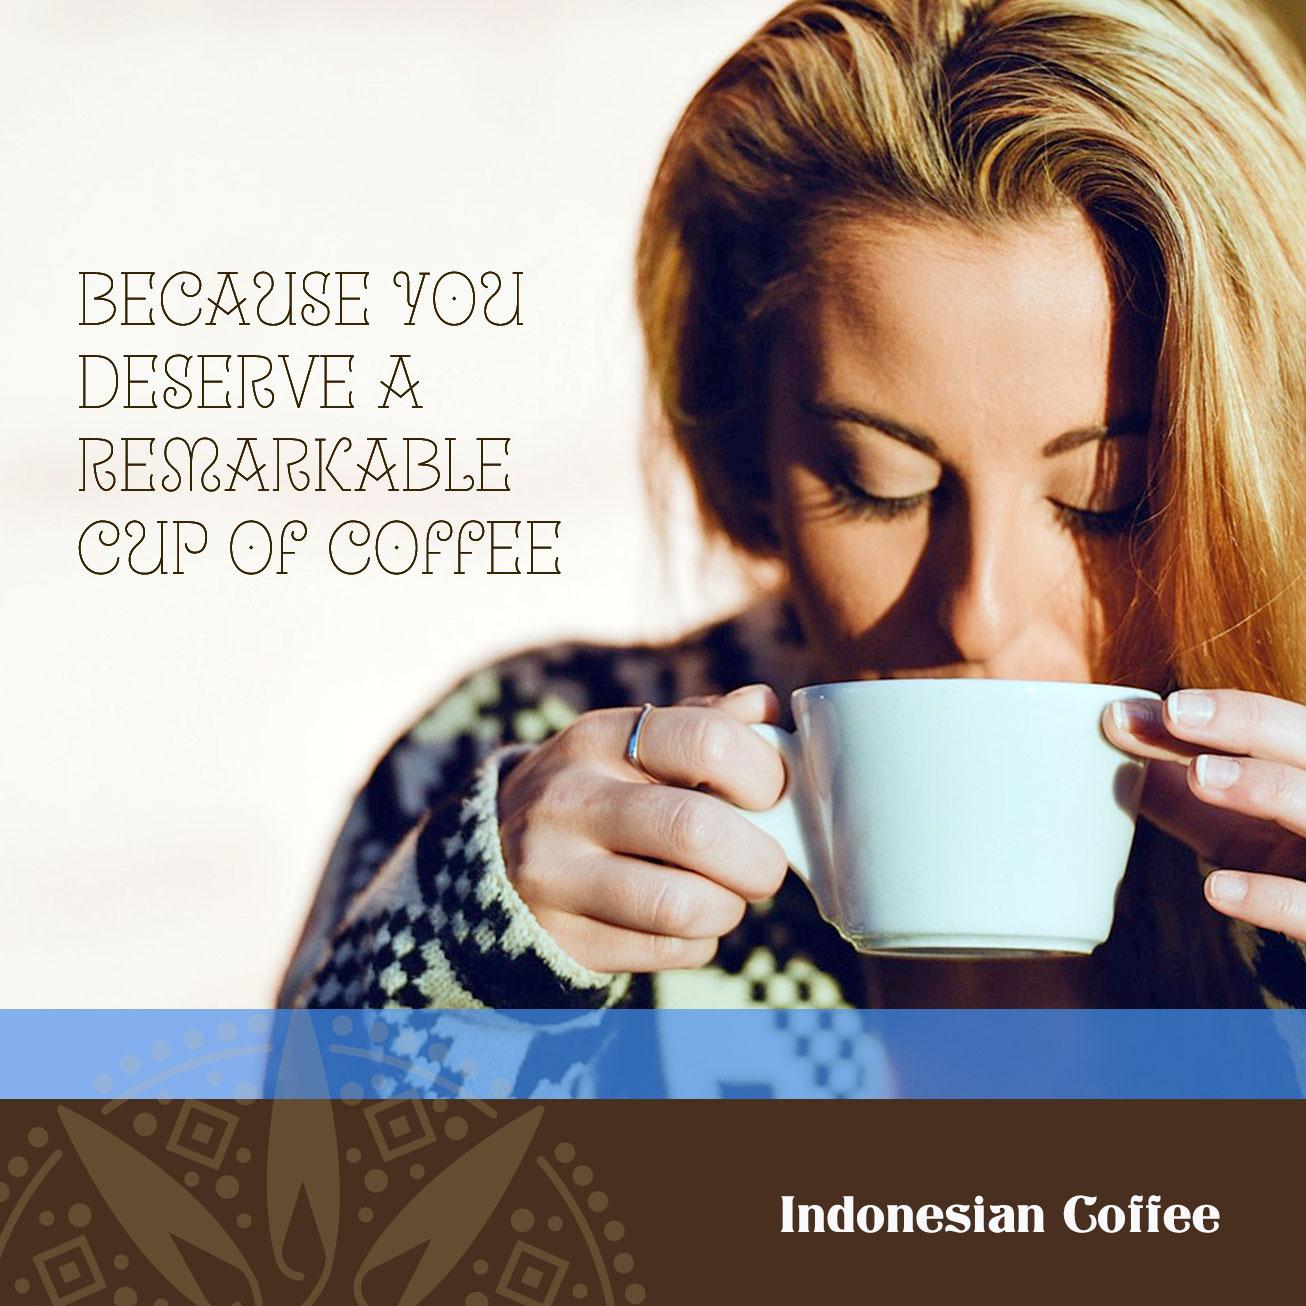 indonesia_memes_remarkable.jpg